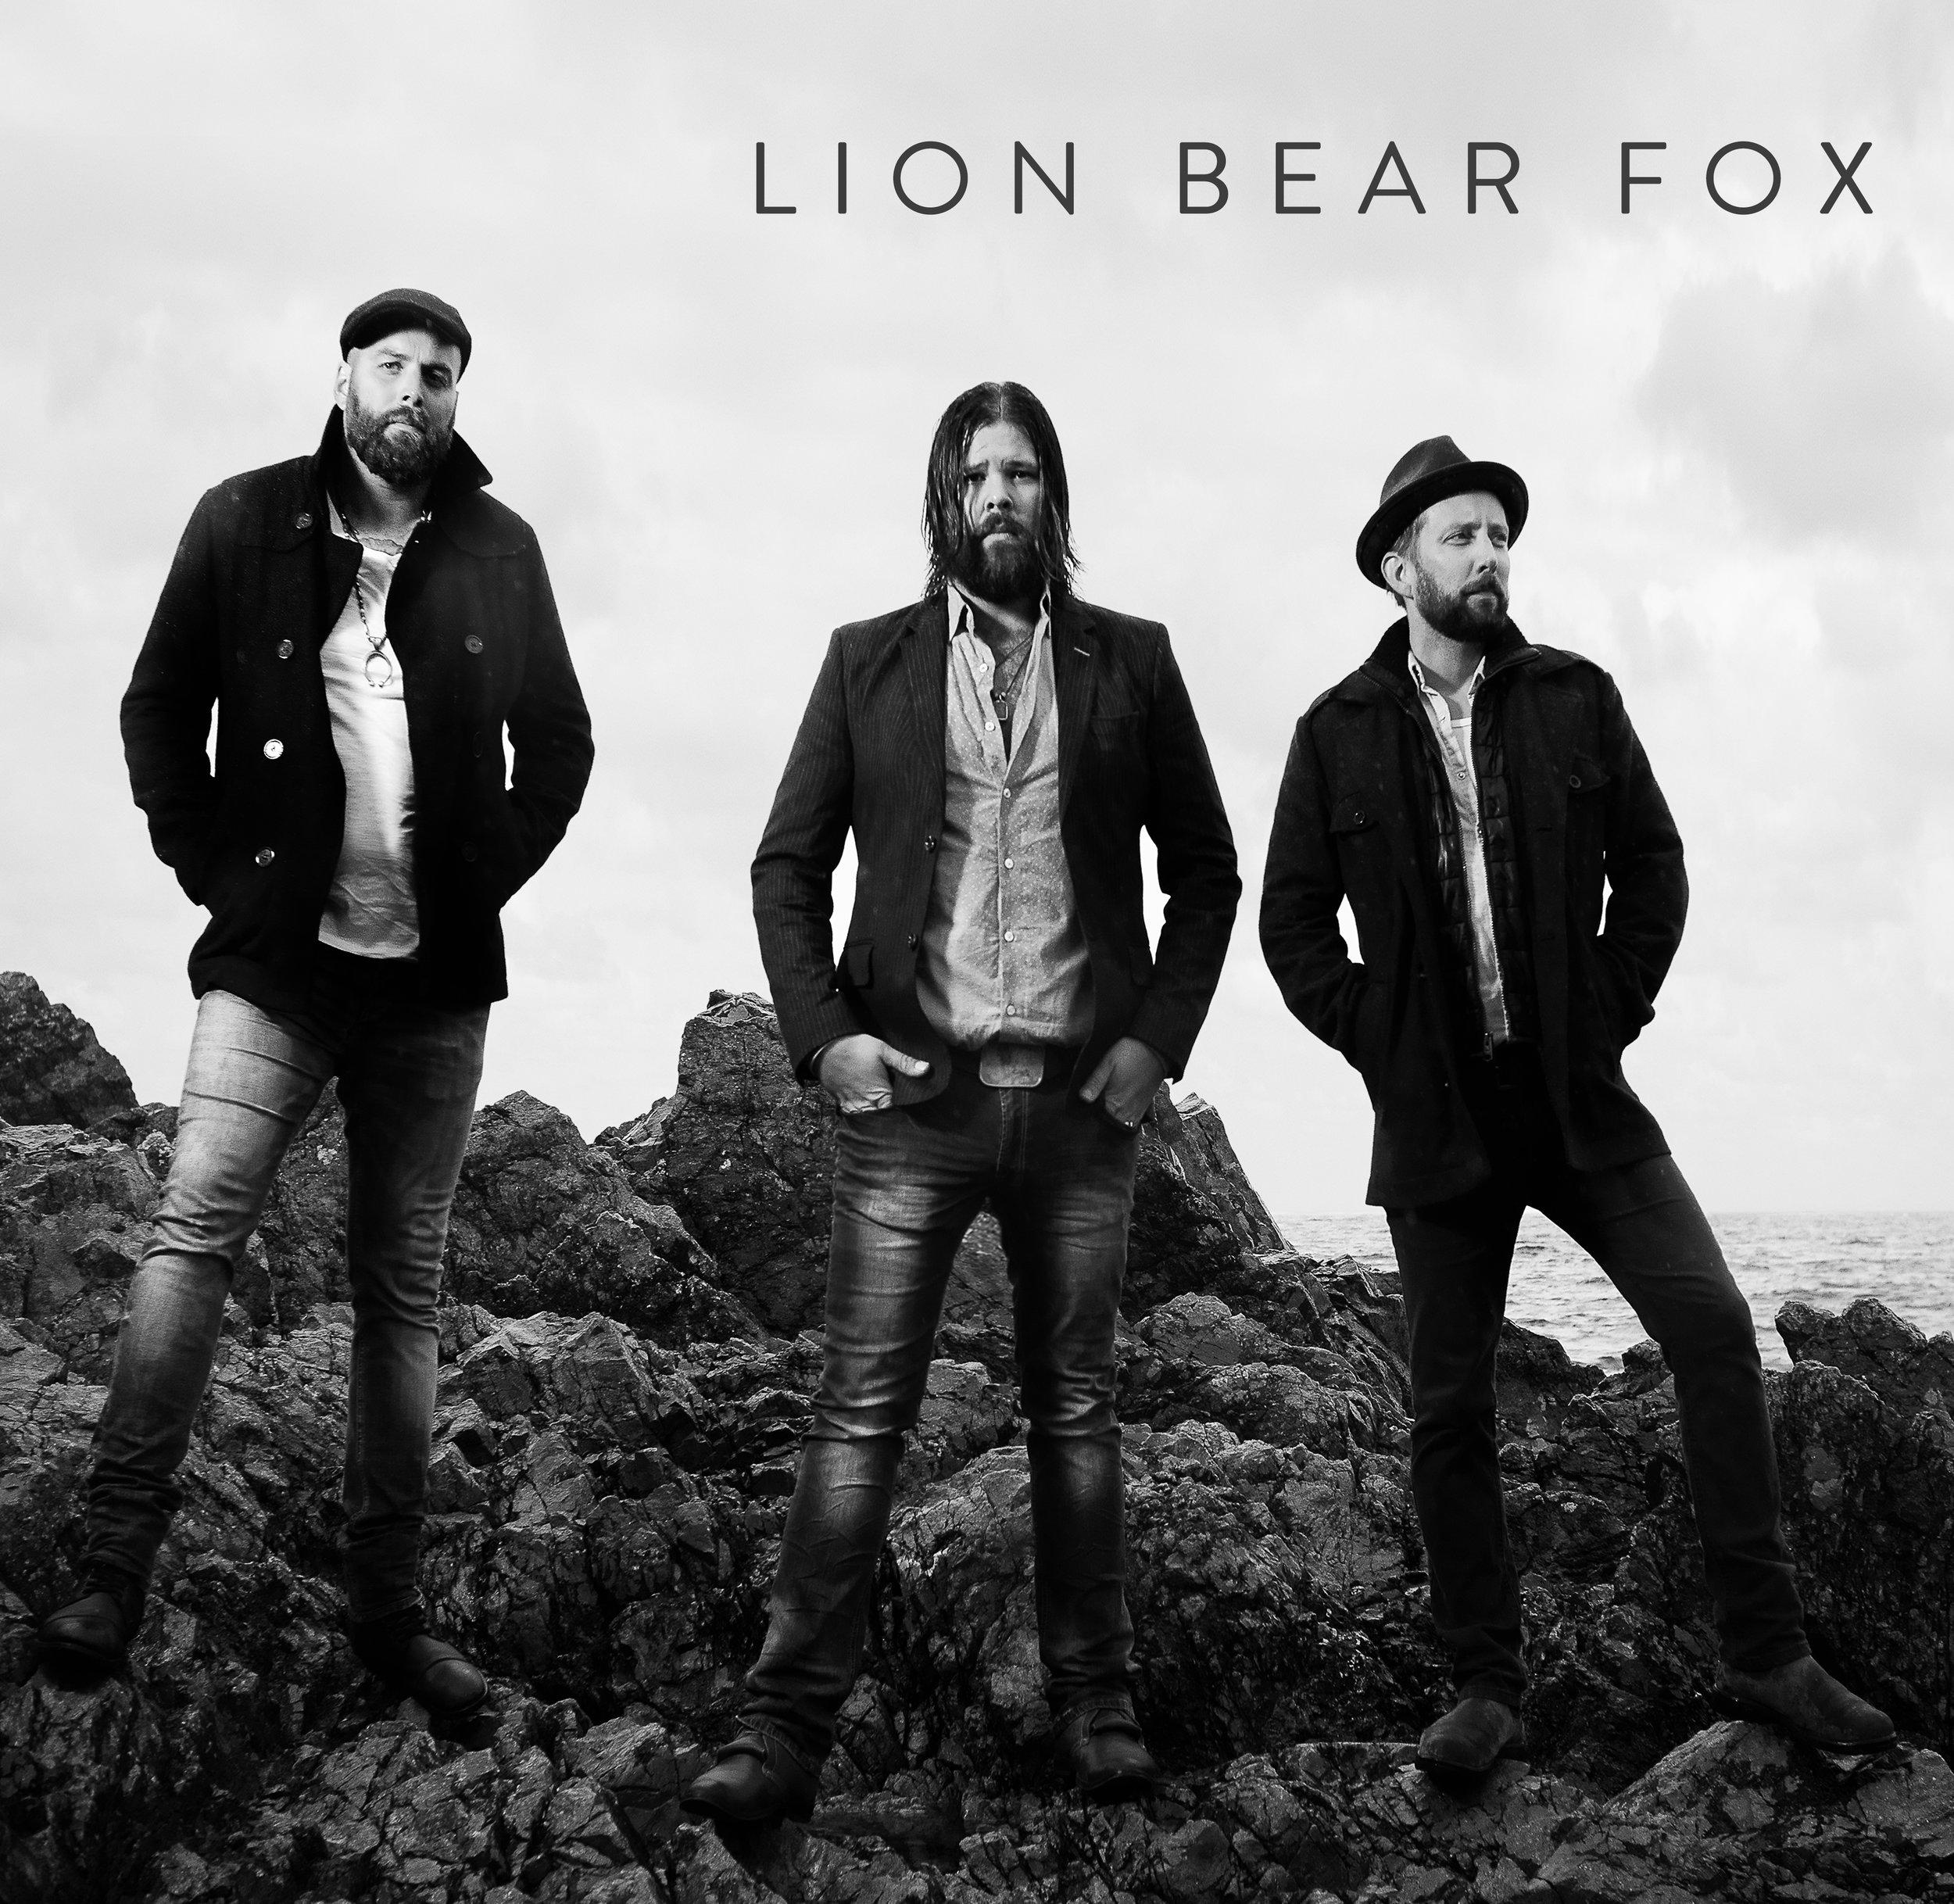 Lion Bear Fox album cover - Photo Credit: Tyler Simpson Photography